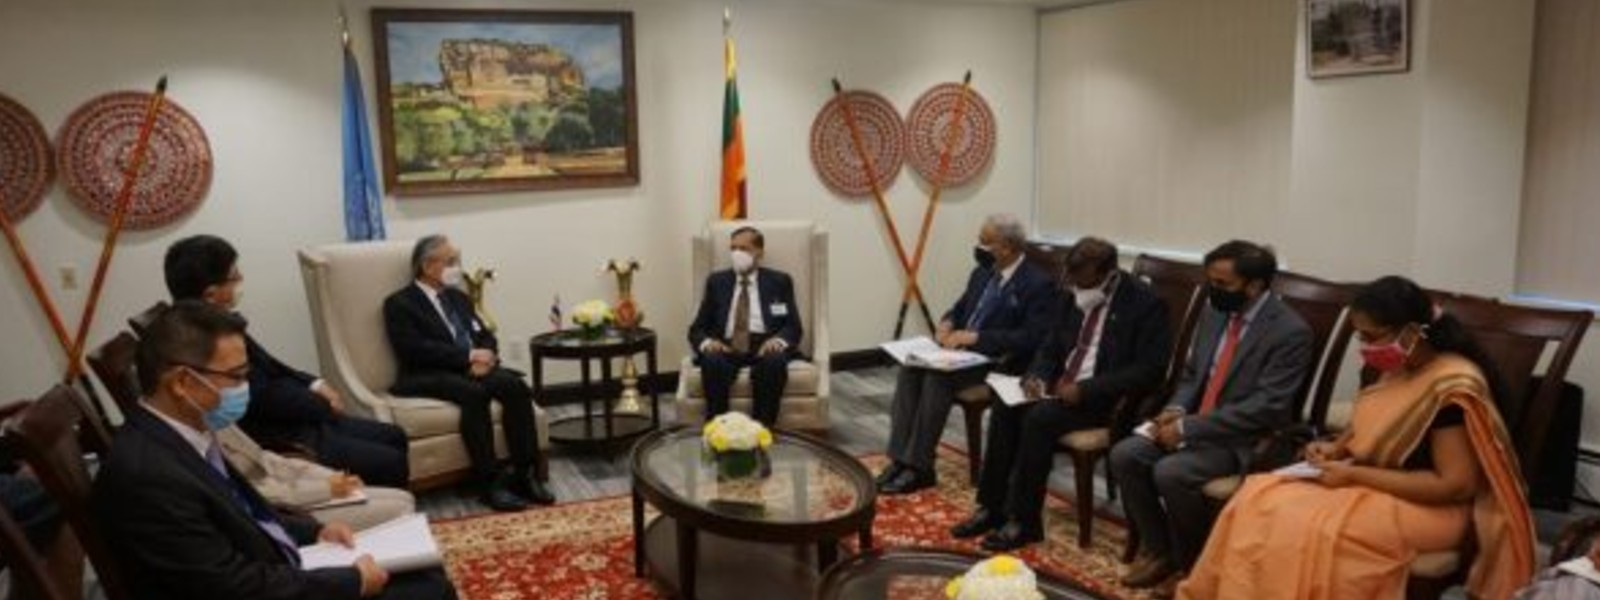 Sri Lankaand Thailandresolve to build on Buddhist Heritage